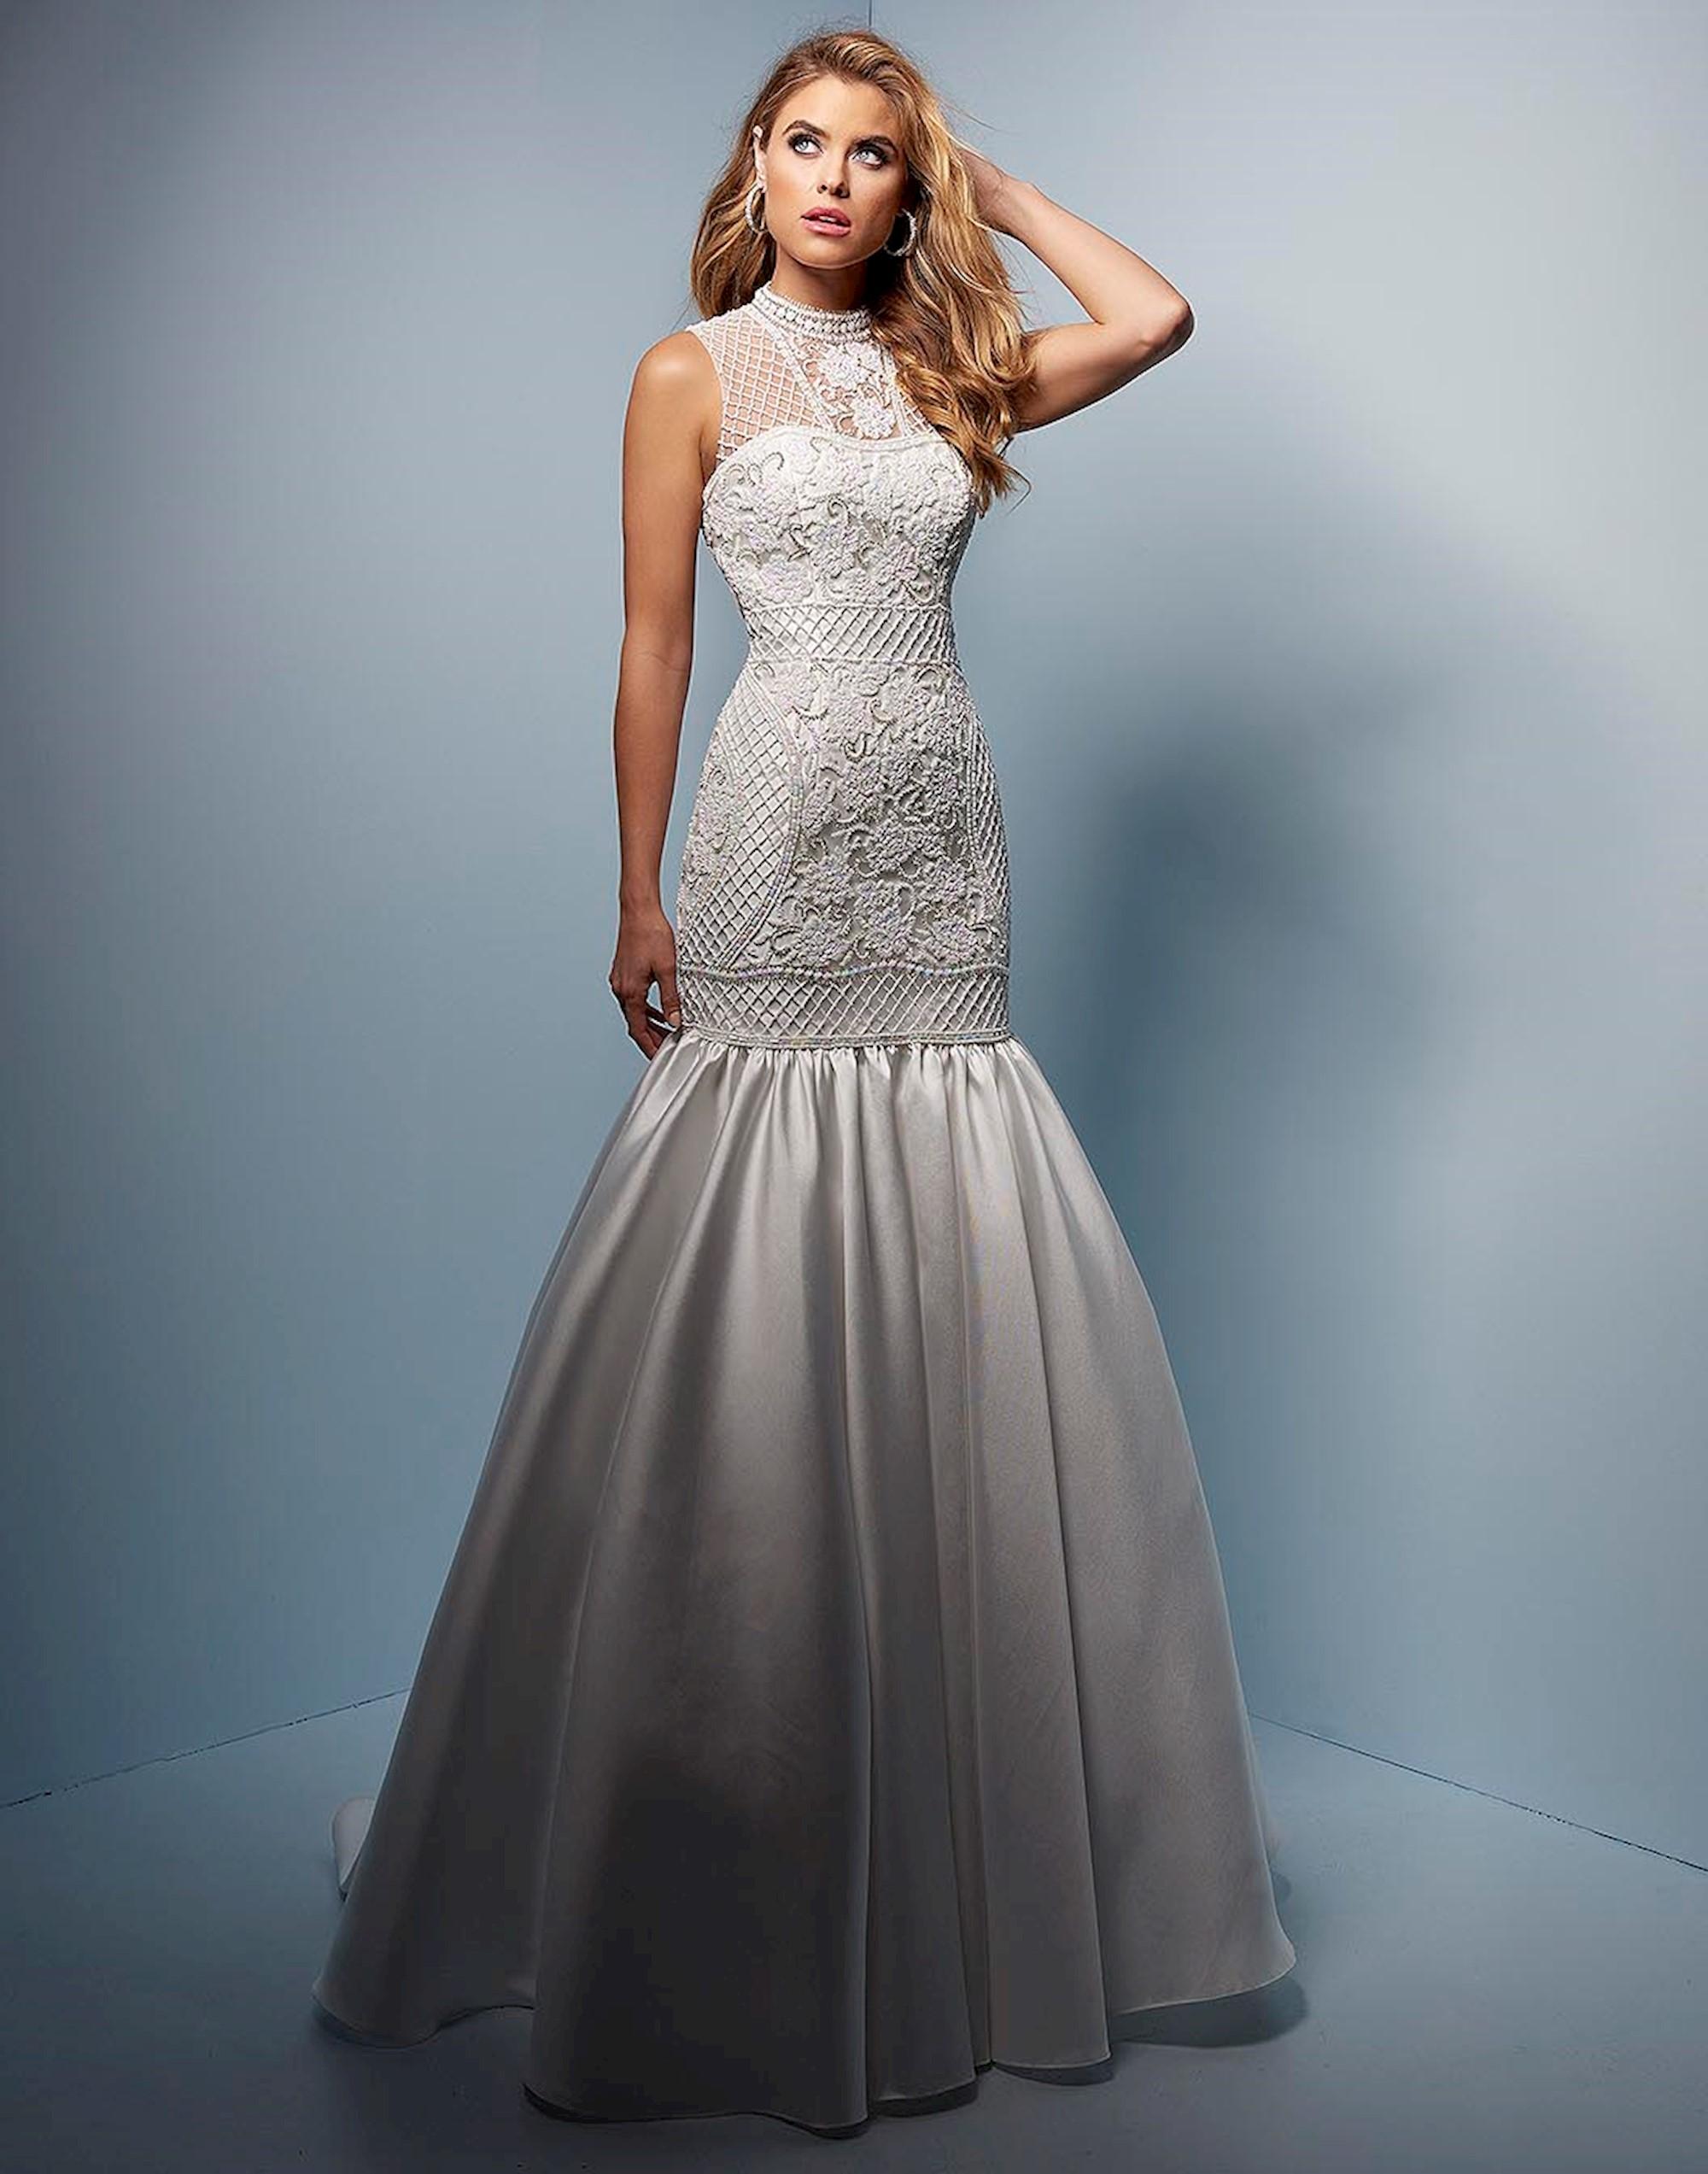 Shop Landa dresses at The Ultimate in Peabody, Massachusetts. - J510